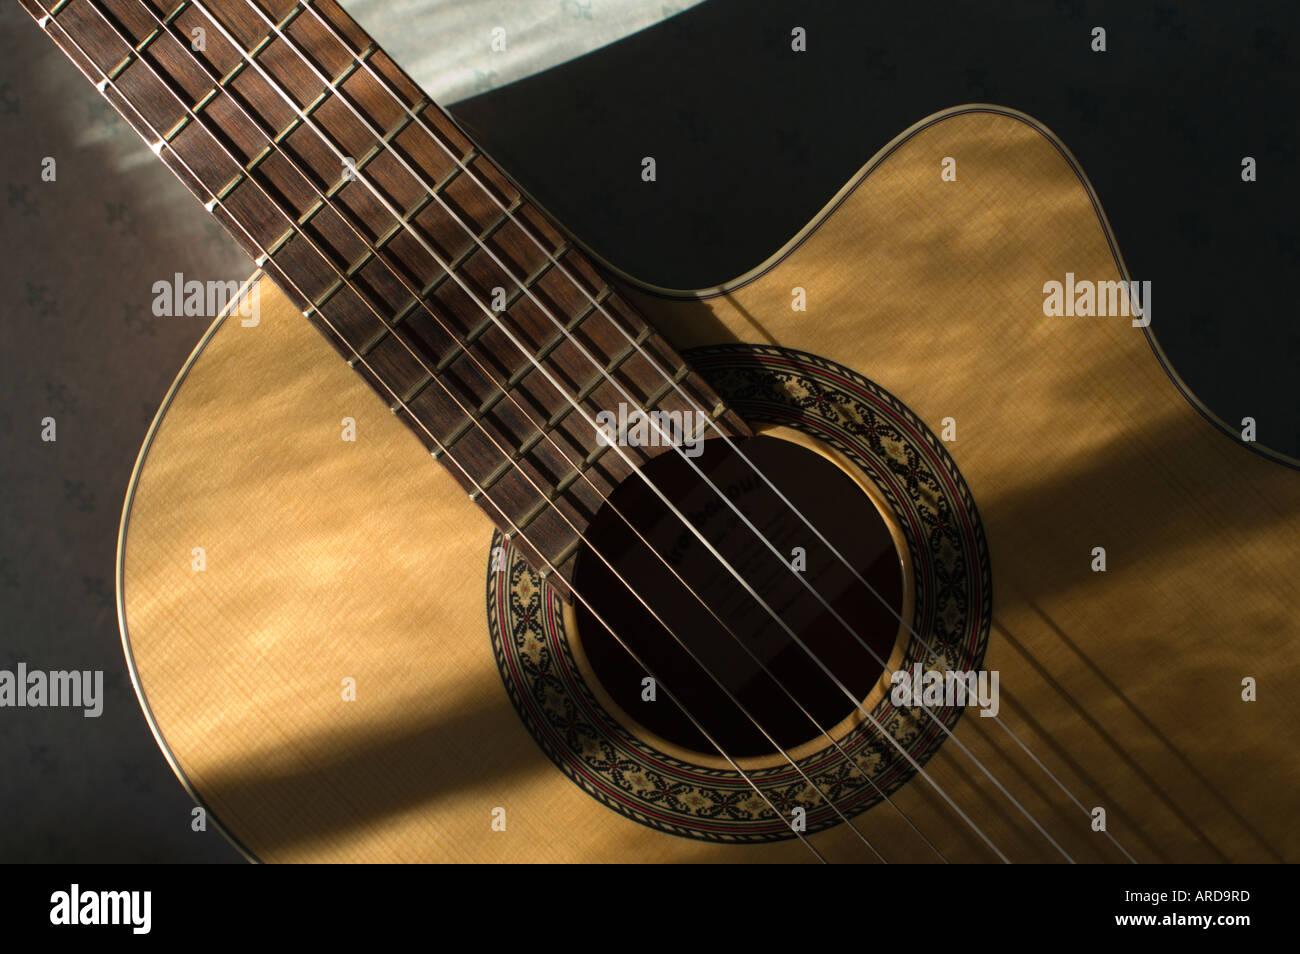 Music Book Cover Design : Album cover design stock photos